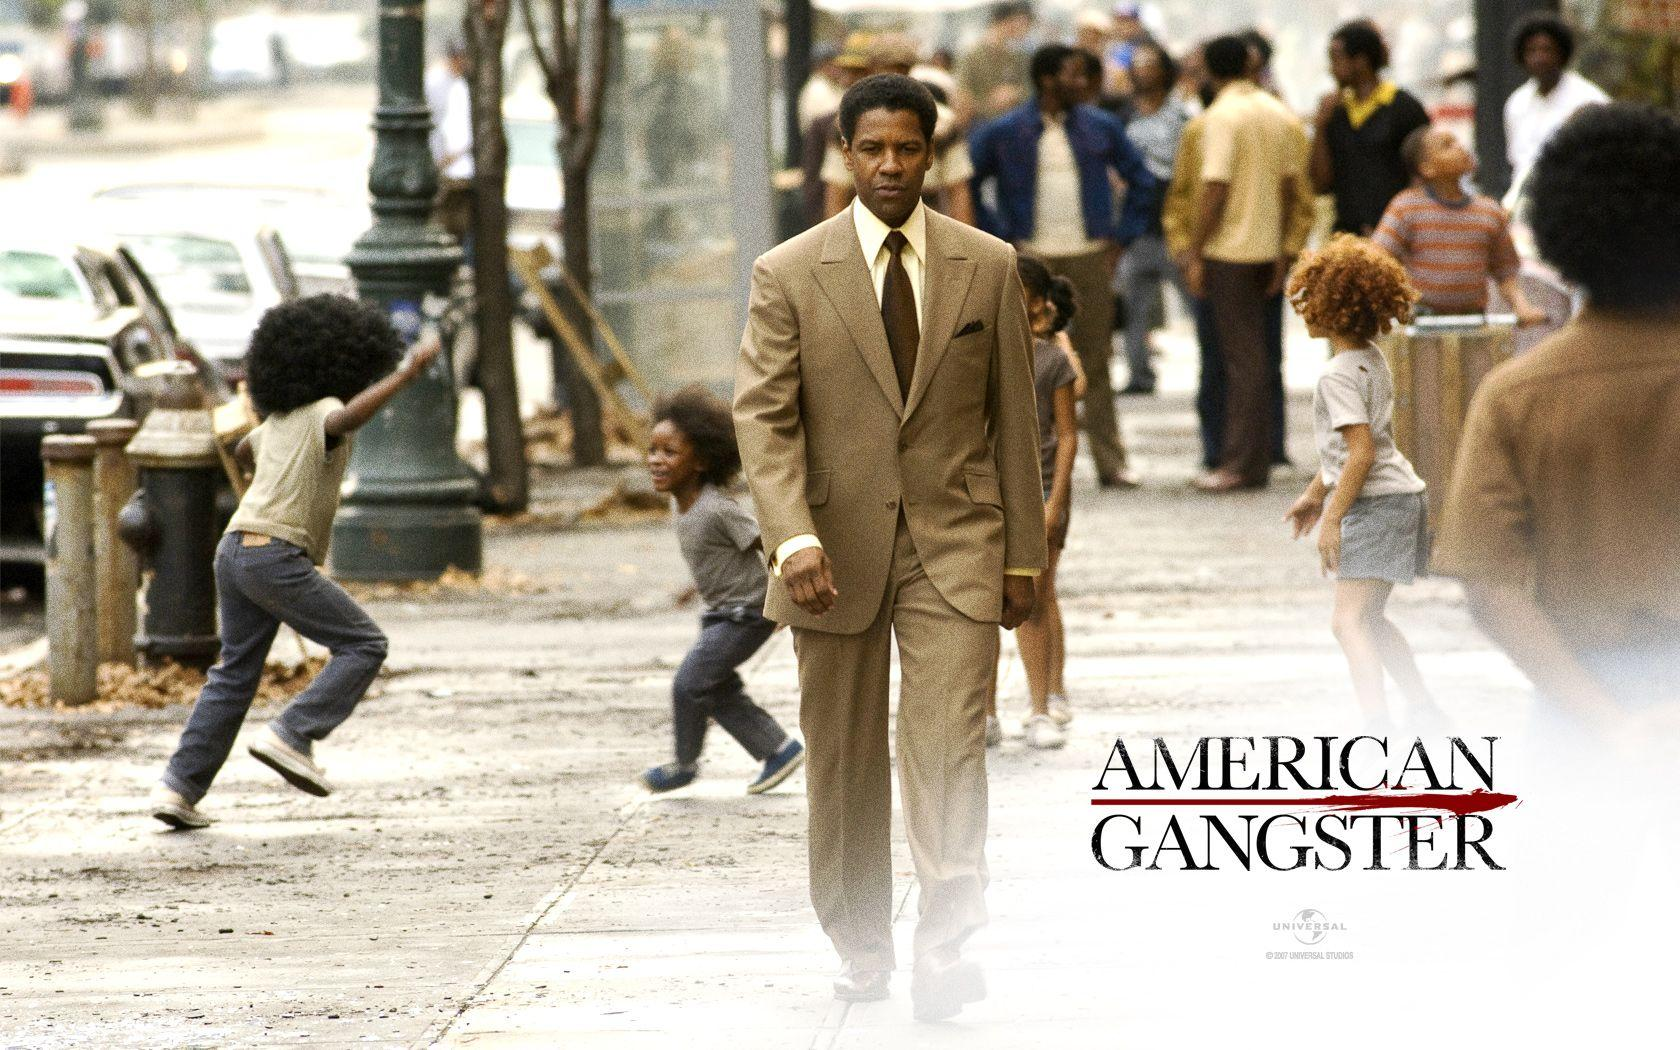 Americna Gangster